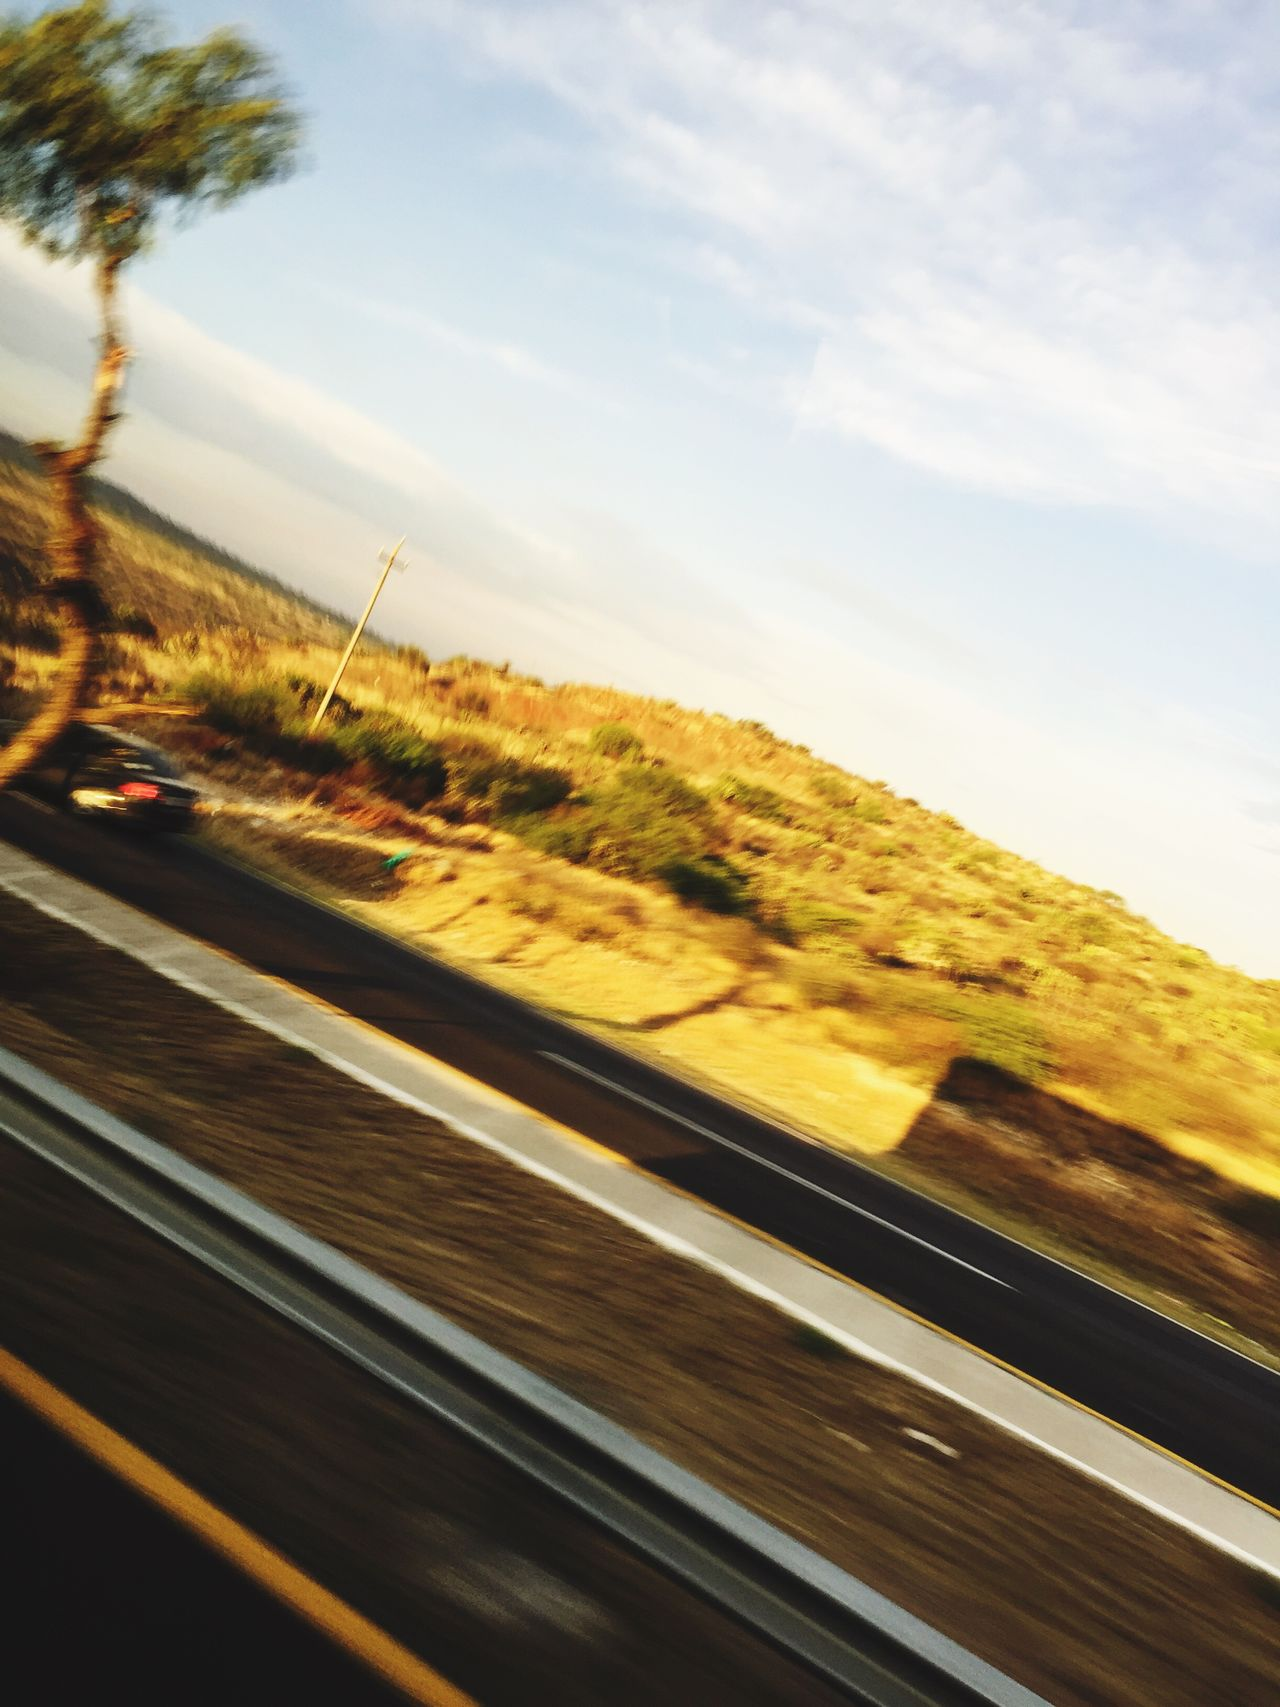 The Street Photographer - 2017 EyeEm Awards On The Road On The Road ! On The Road. Highway Fast EyeEm Best Shots EyeEm Gallery Eye Em Around The World EyeEm UntilTheEndOfTime Speed Behind To The Windows Around To Mexico Go Away